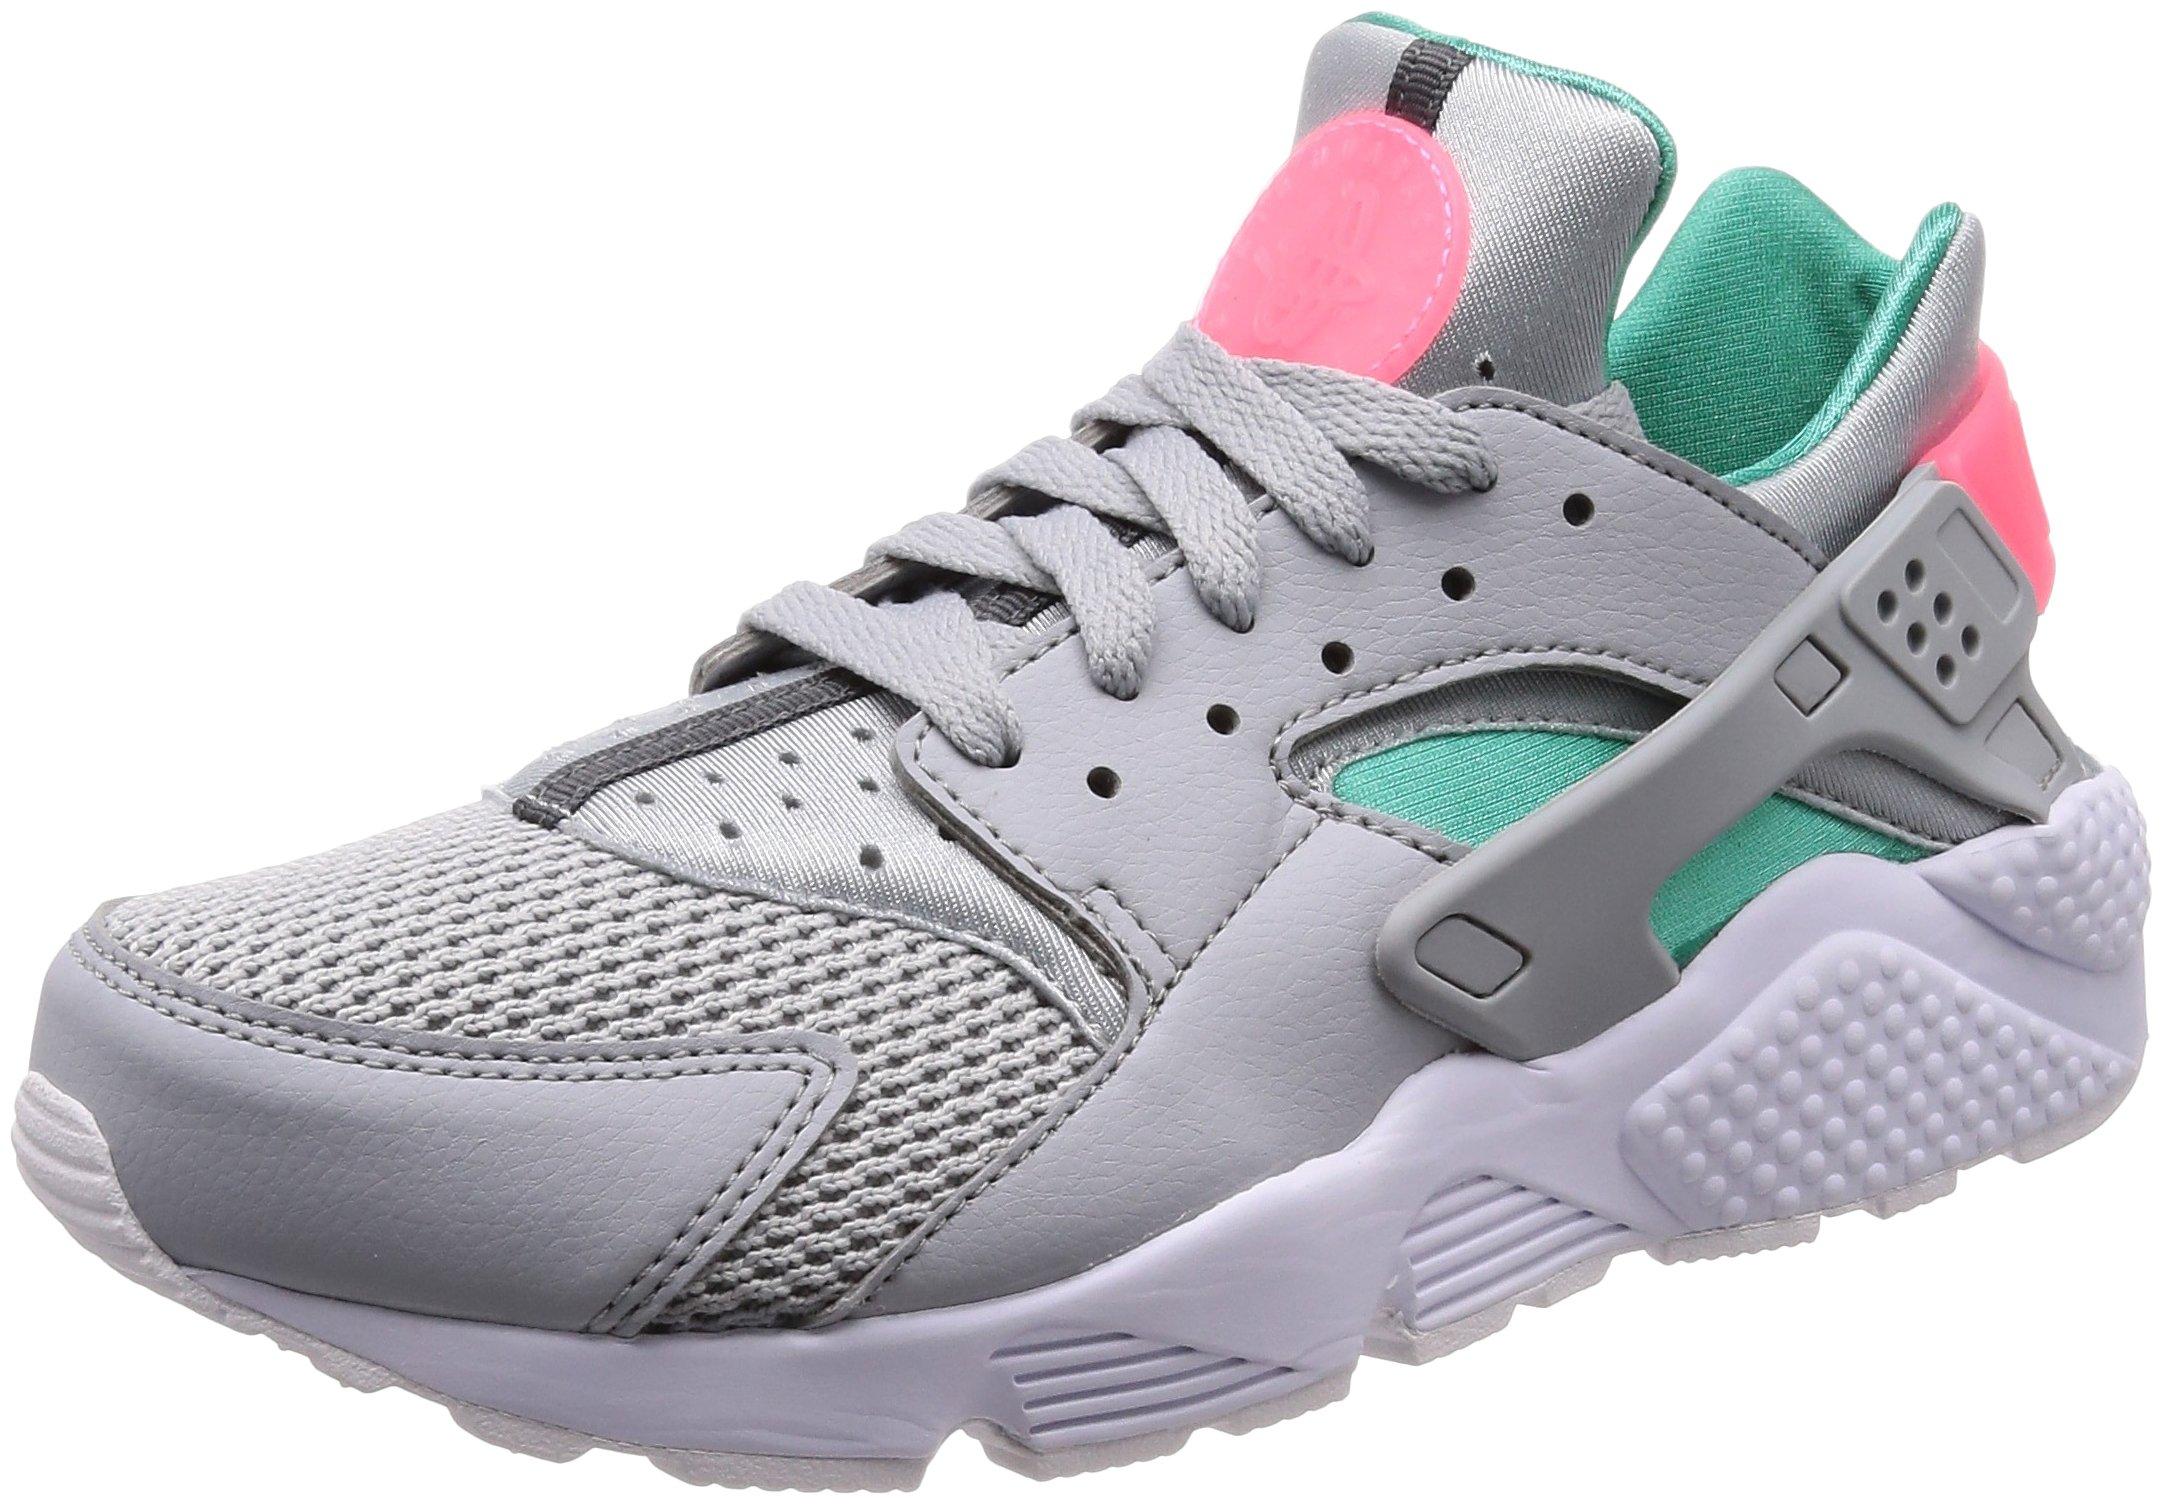 wholesale dealer 9e6ba 25999 NIKE Air Huarache Men's Running Shoes Wolf Grey/Sunset Pulse 318429-053 12  M US